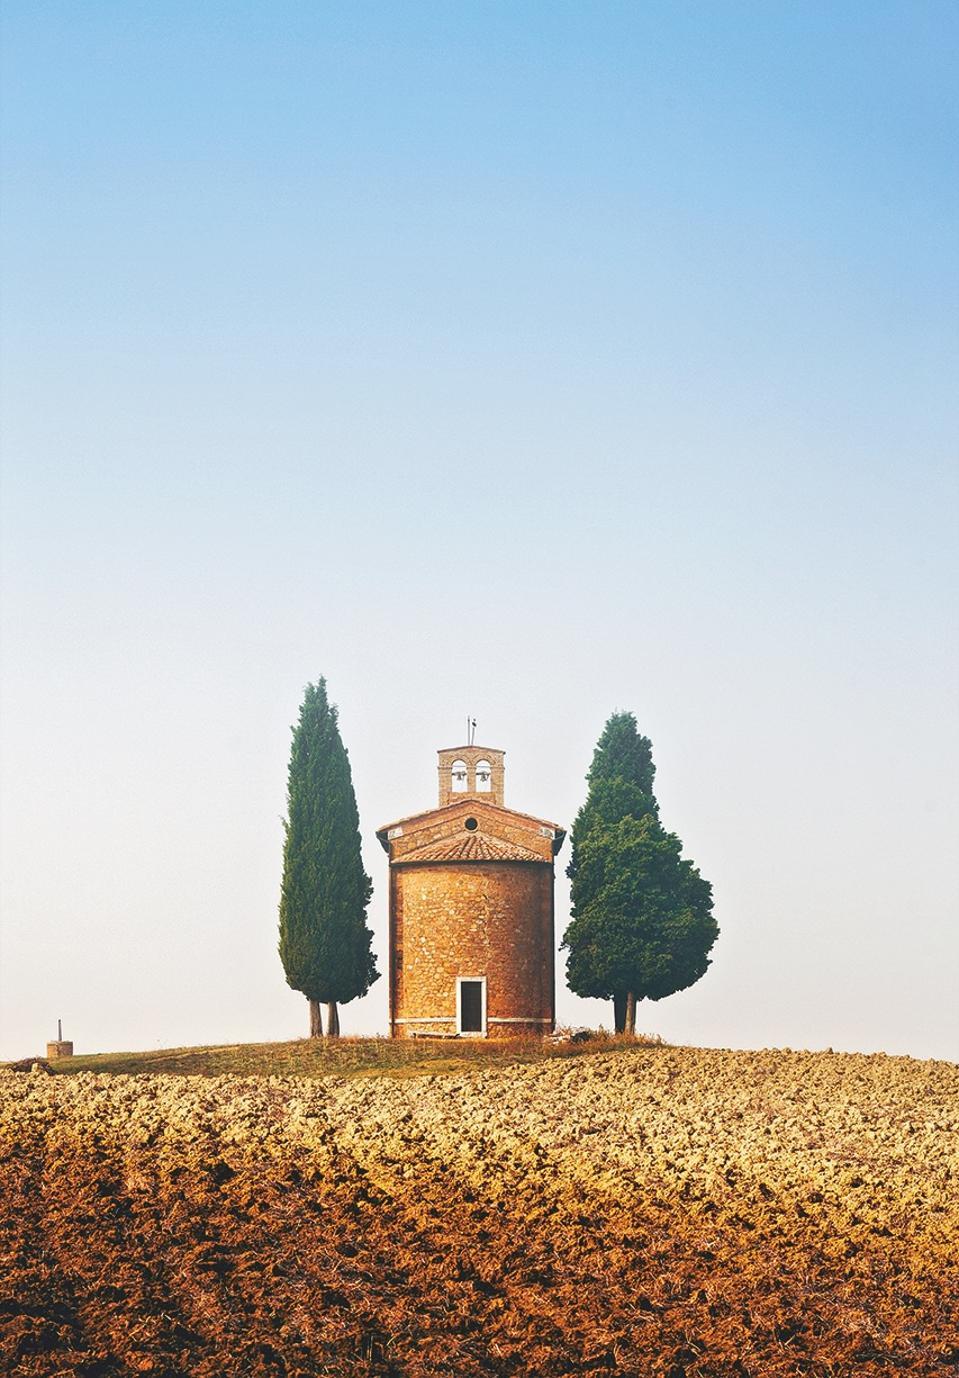 Church in the mist on the hillside